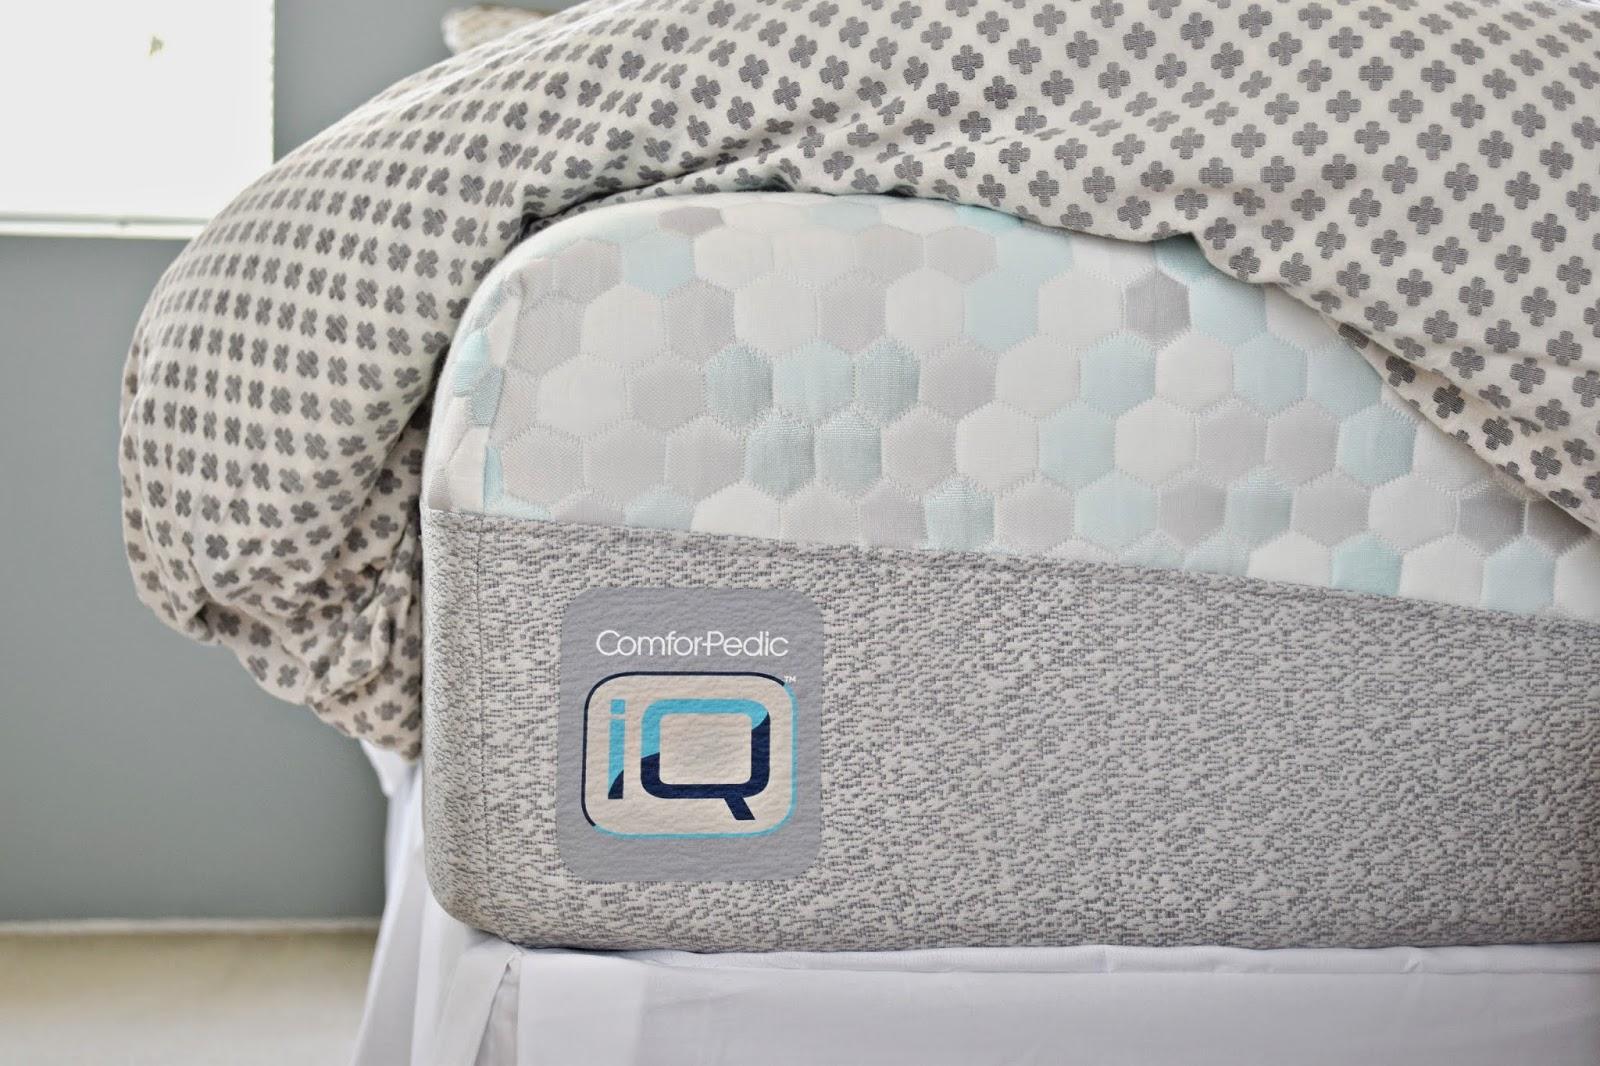 Mommy Testers, Simmons ComforPedic iQ, Comforpedic iQ mattress, ComforPedic iQ review, #UpgradeYourSleep